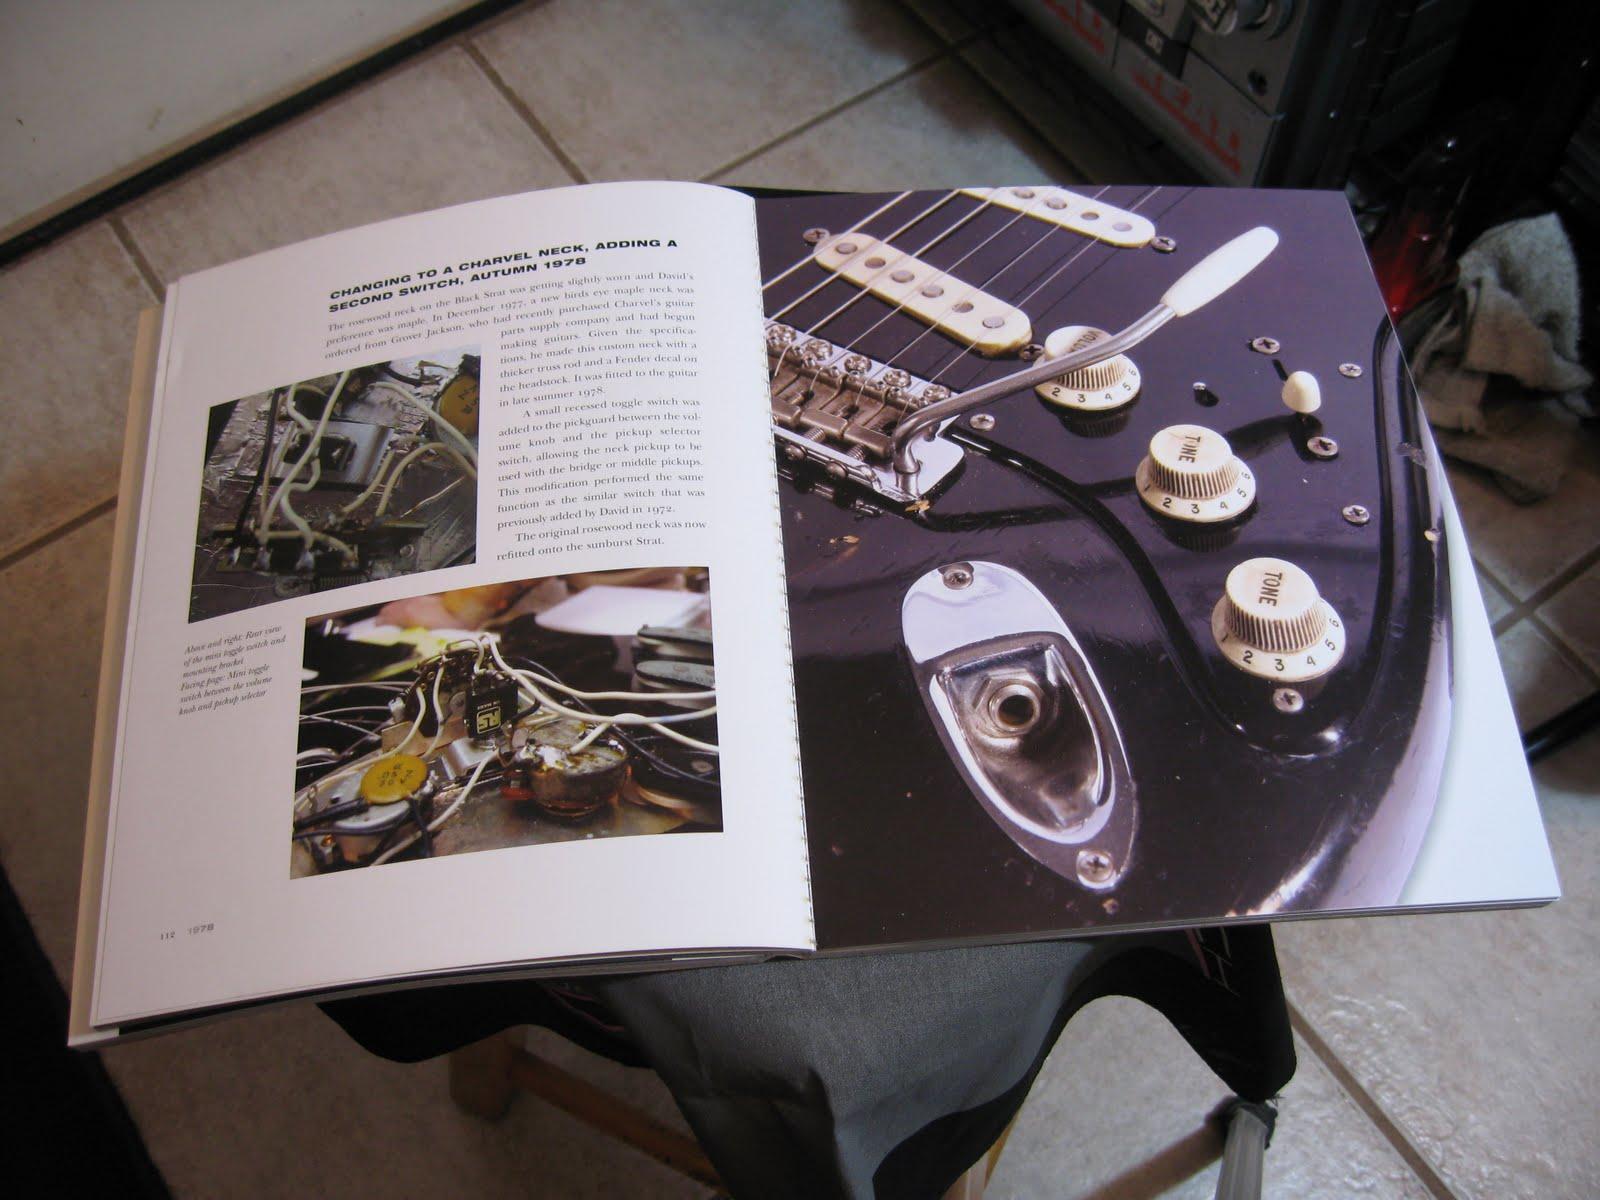 Loeuvre On Connait Lartisan 2011 The David Gilmour Black Strat Wiring Diagram Closeup Of